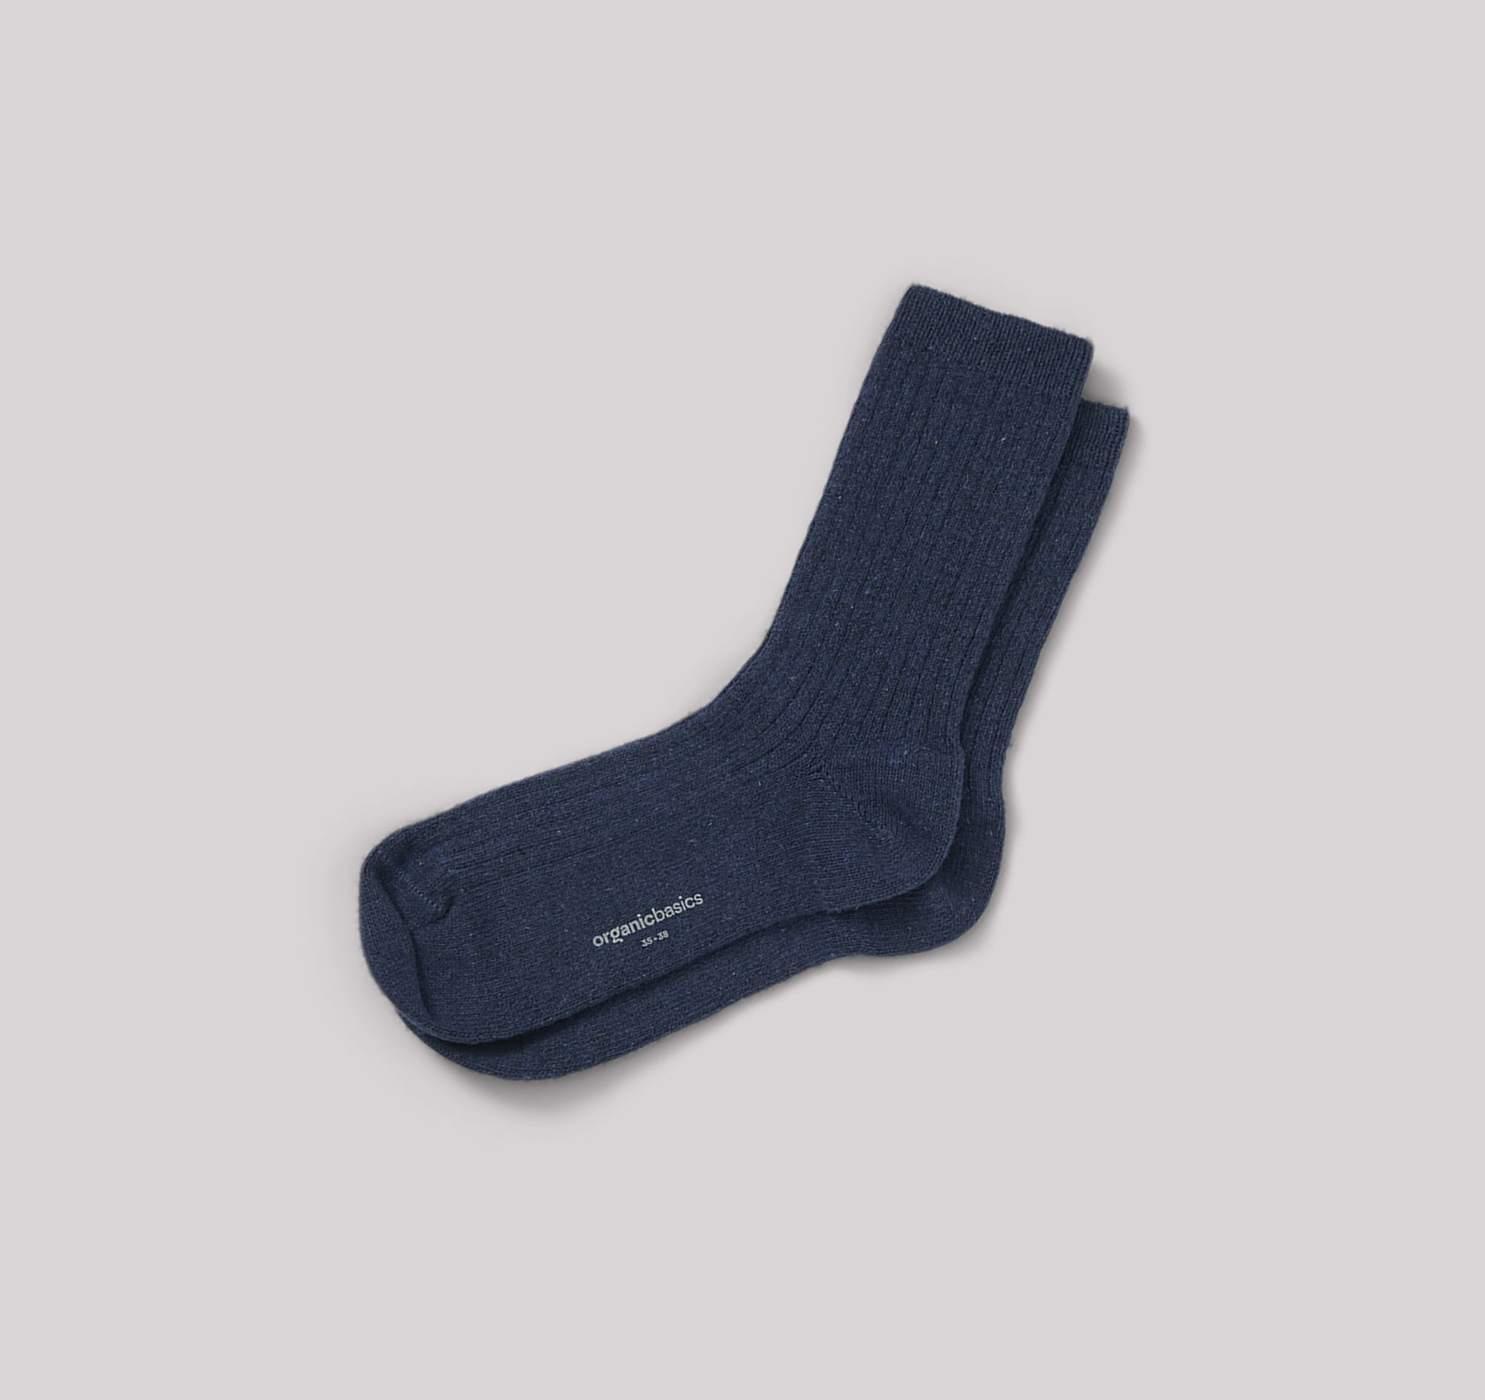 Recycled Denim Socks